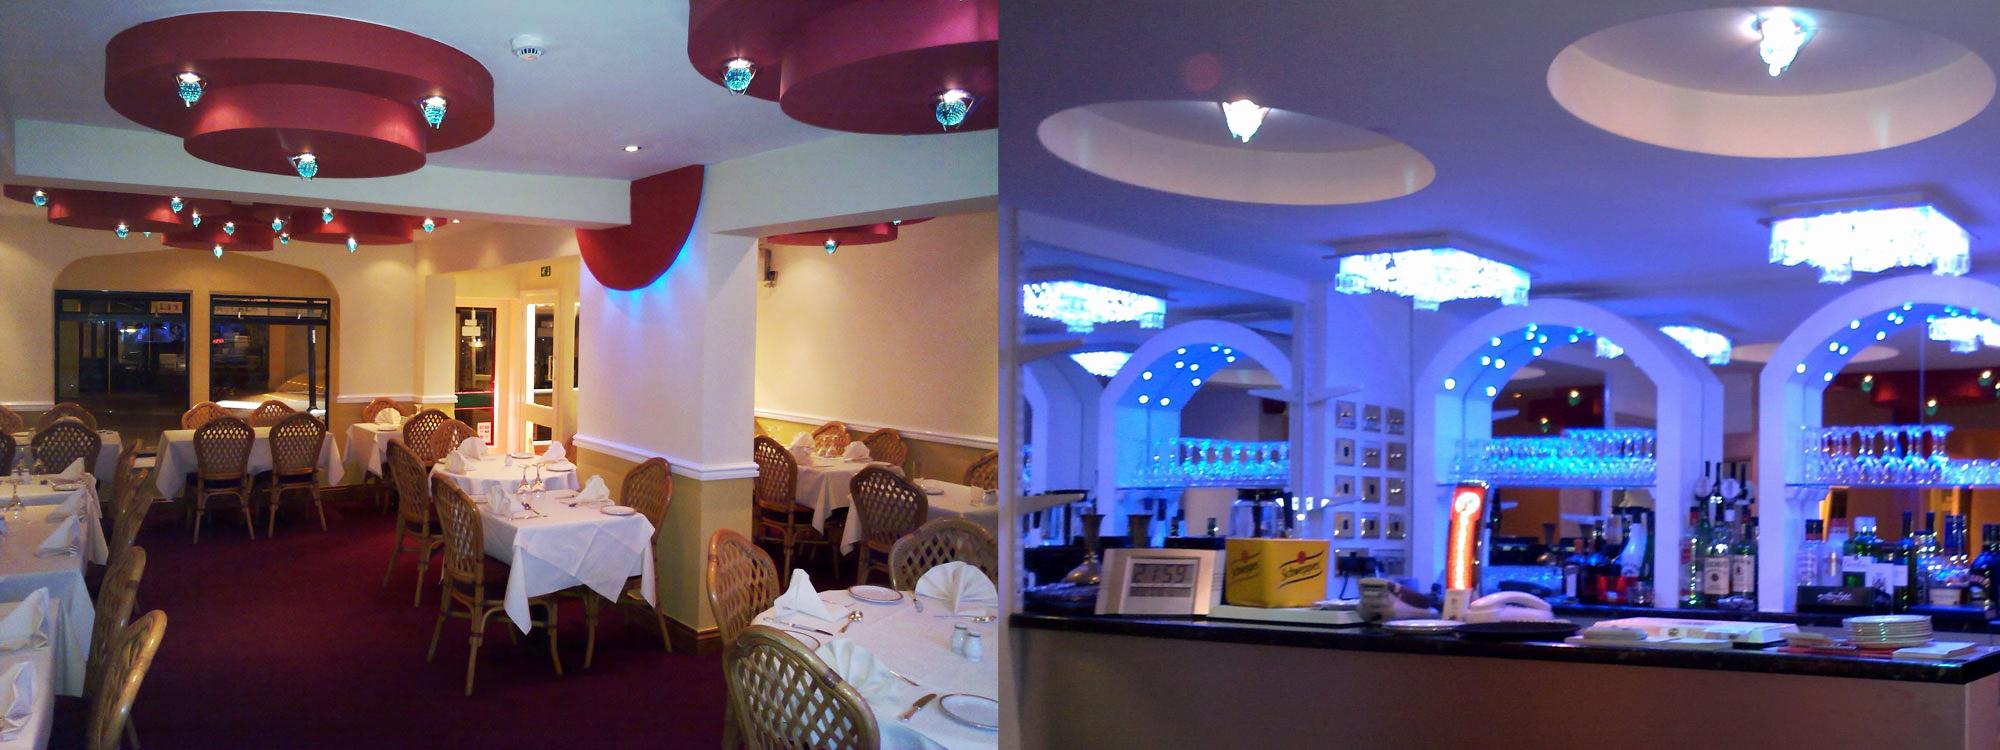 Chilli Nights Indian Restaurant Haslemere